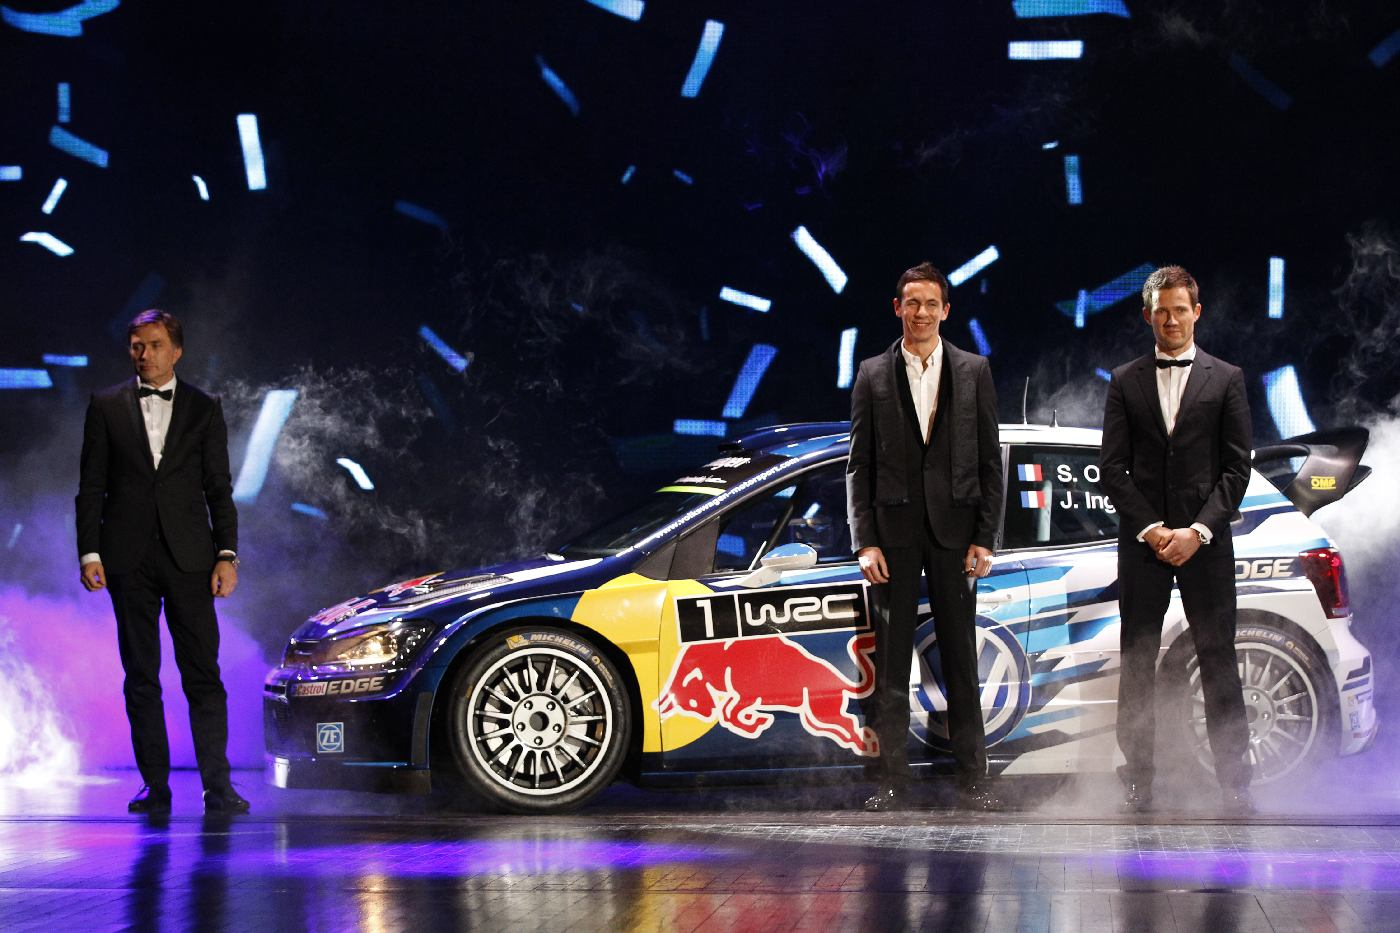 Sebastien Ogier and Julien Ingrassia, portrait during the FIA Prize Giving 2015 on December 4th 2015, at Paris, France. Photo Jean Michel Le Meur / DPPI